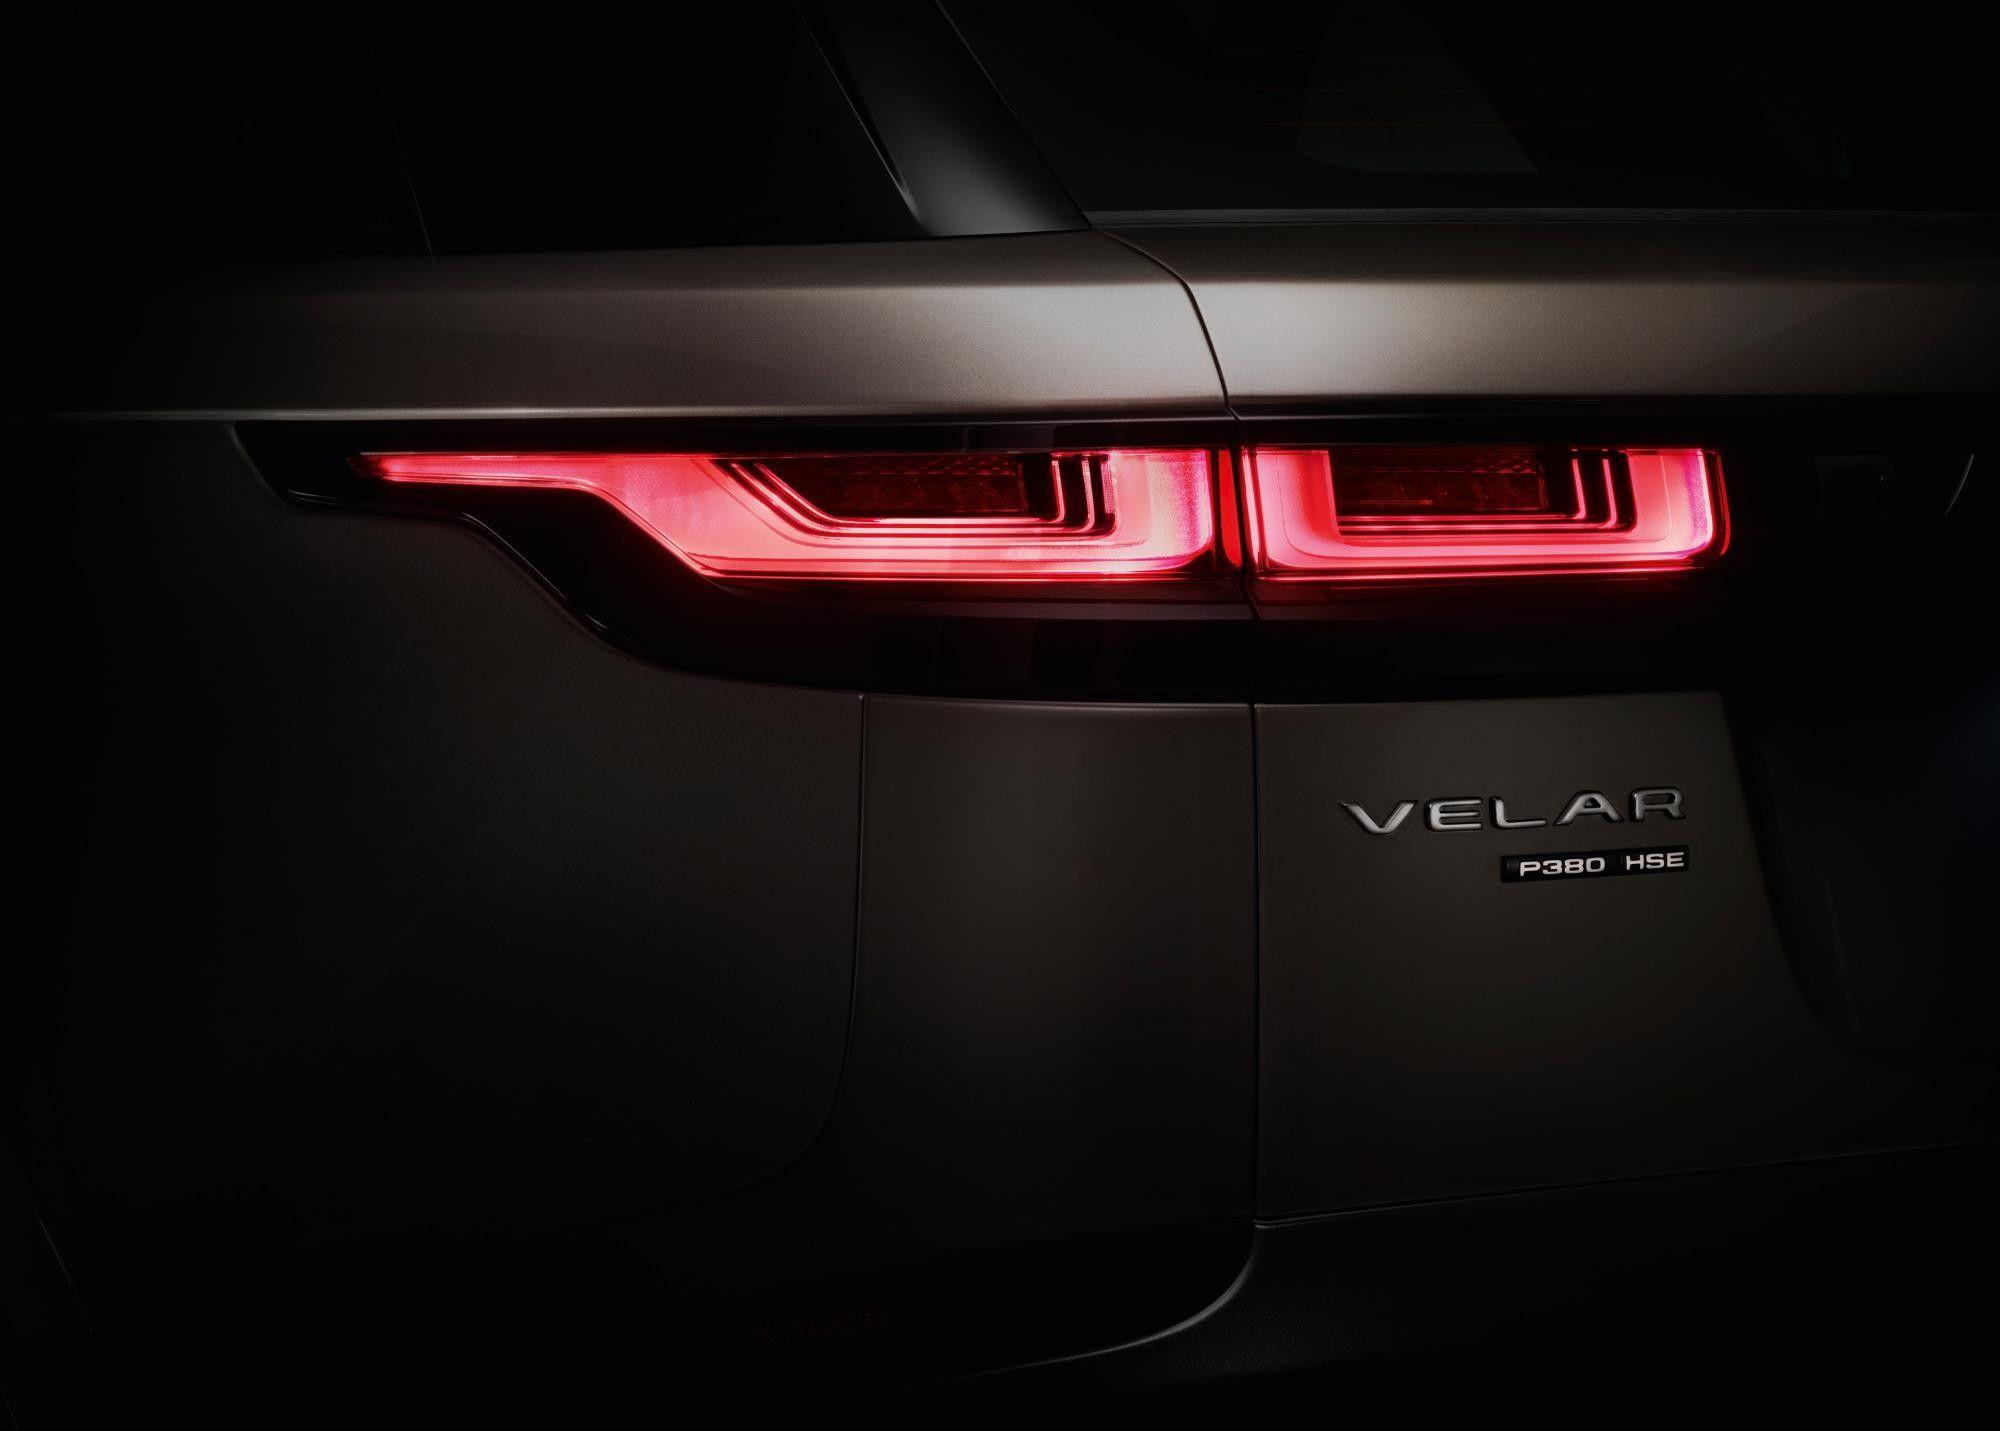 2020 Road Rover Electric Suv Could Be An Allroad Style Wagon Autoevolution Range Rover Design Range Rover Evoque